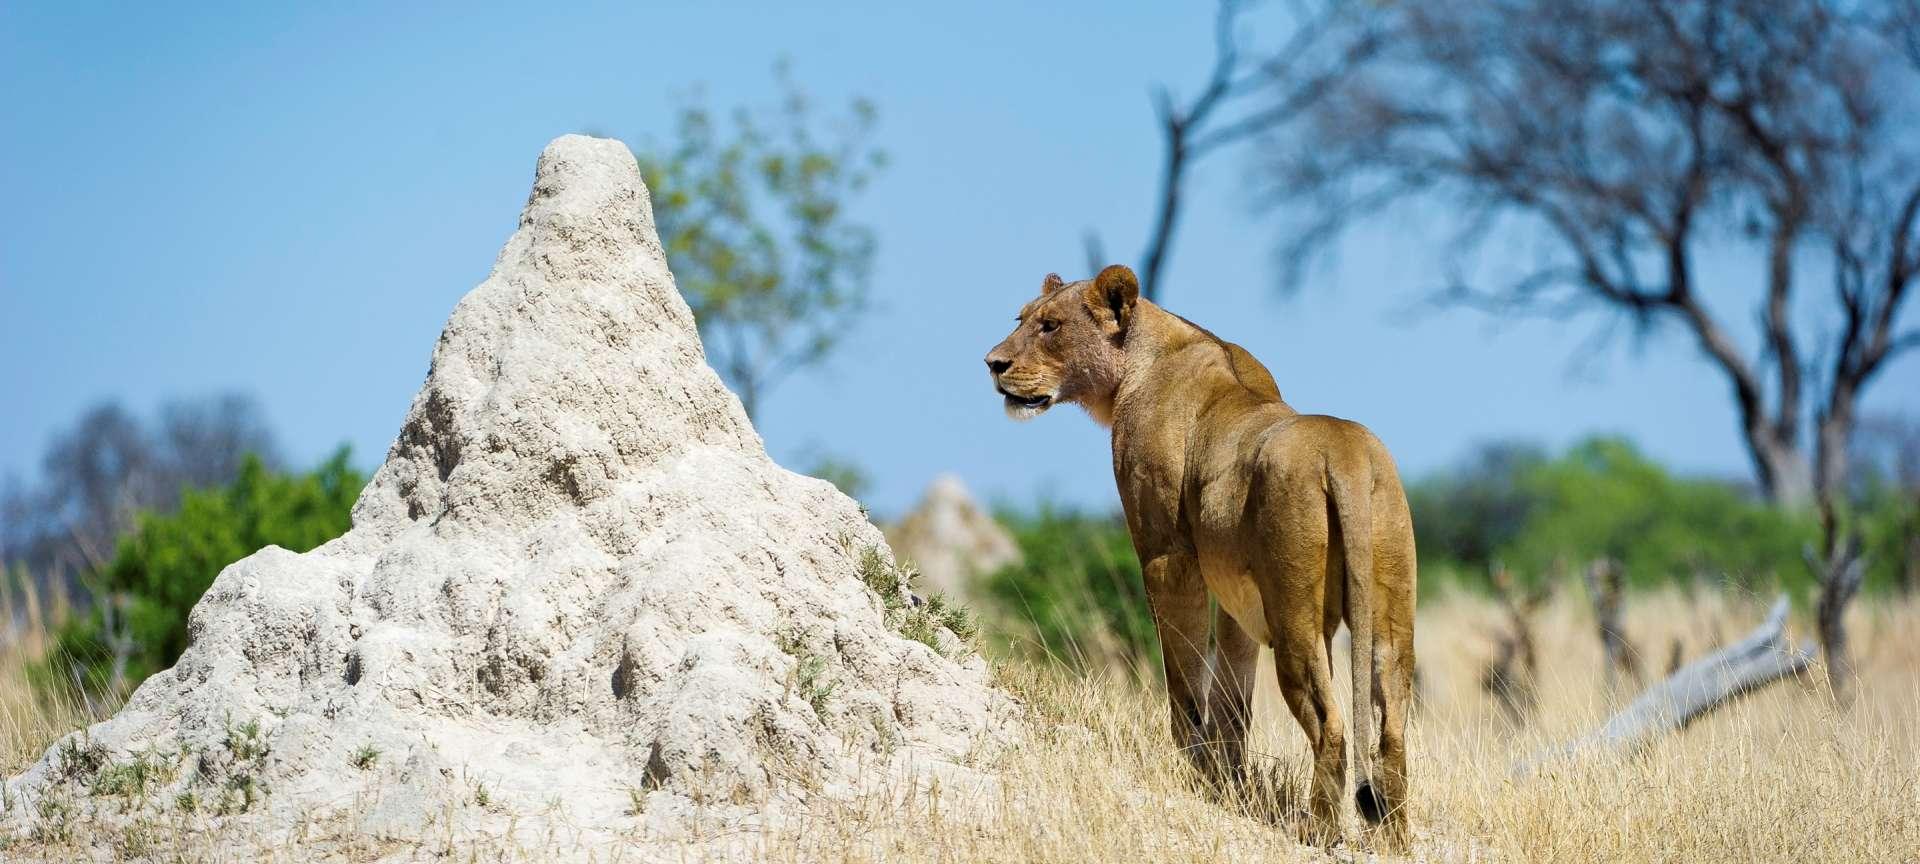 Hwange National Park - Africa Wildlife Safaris